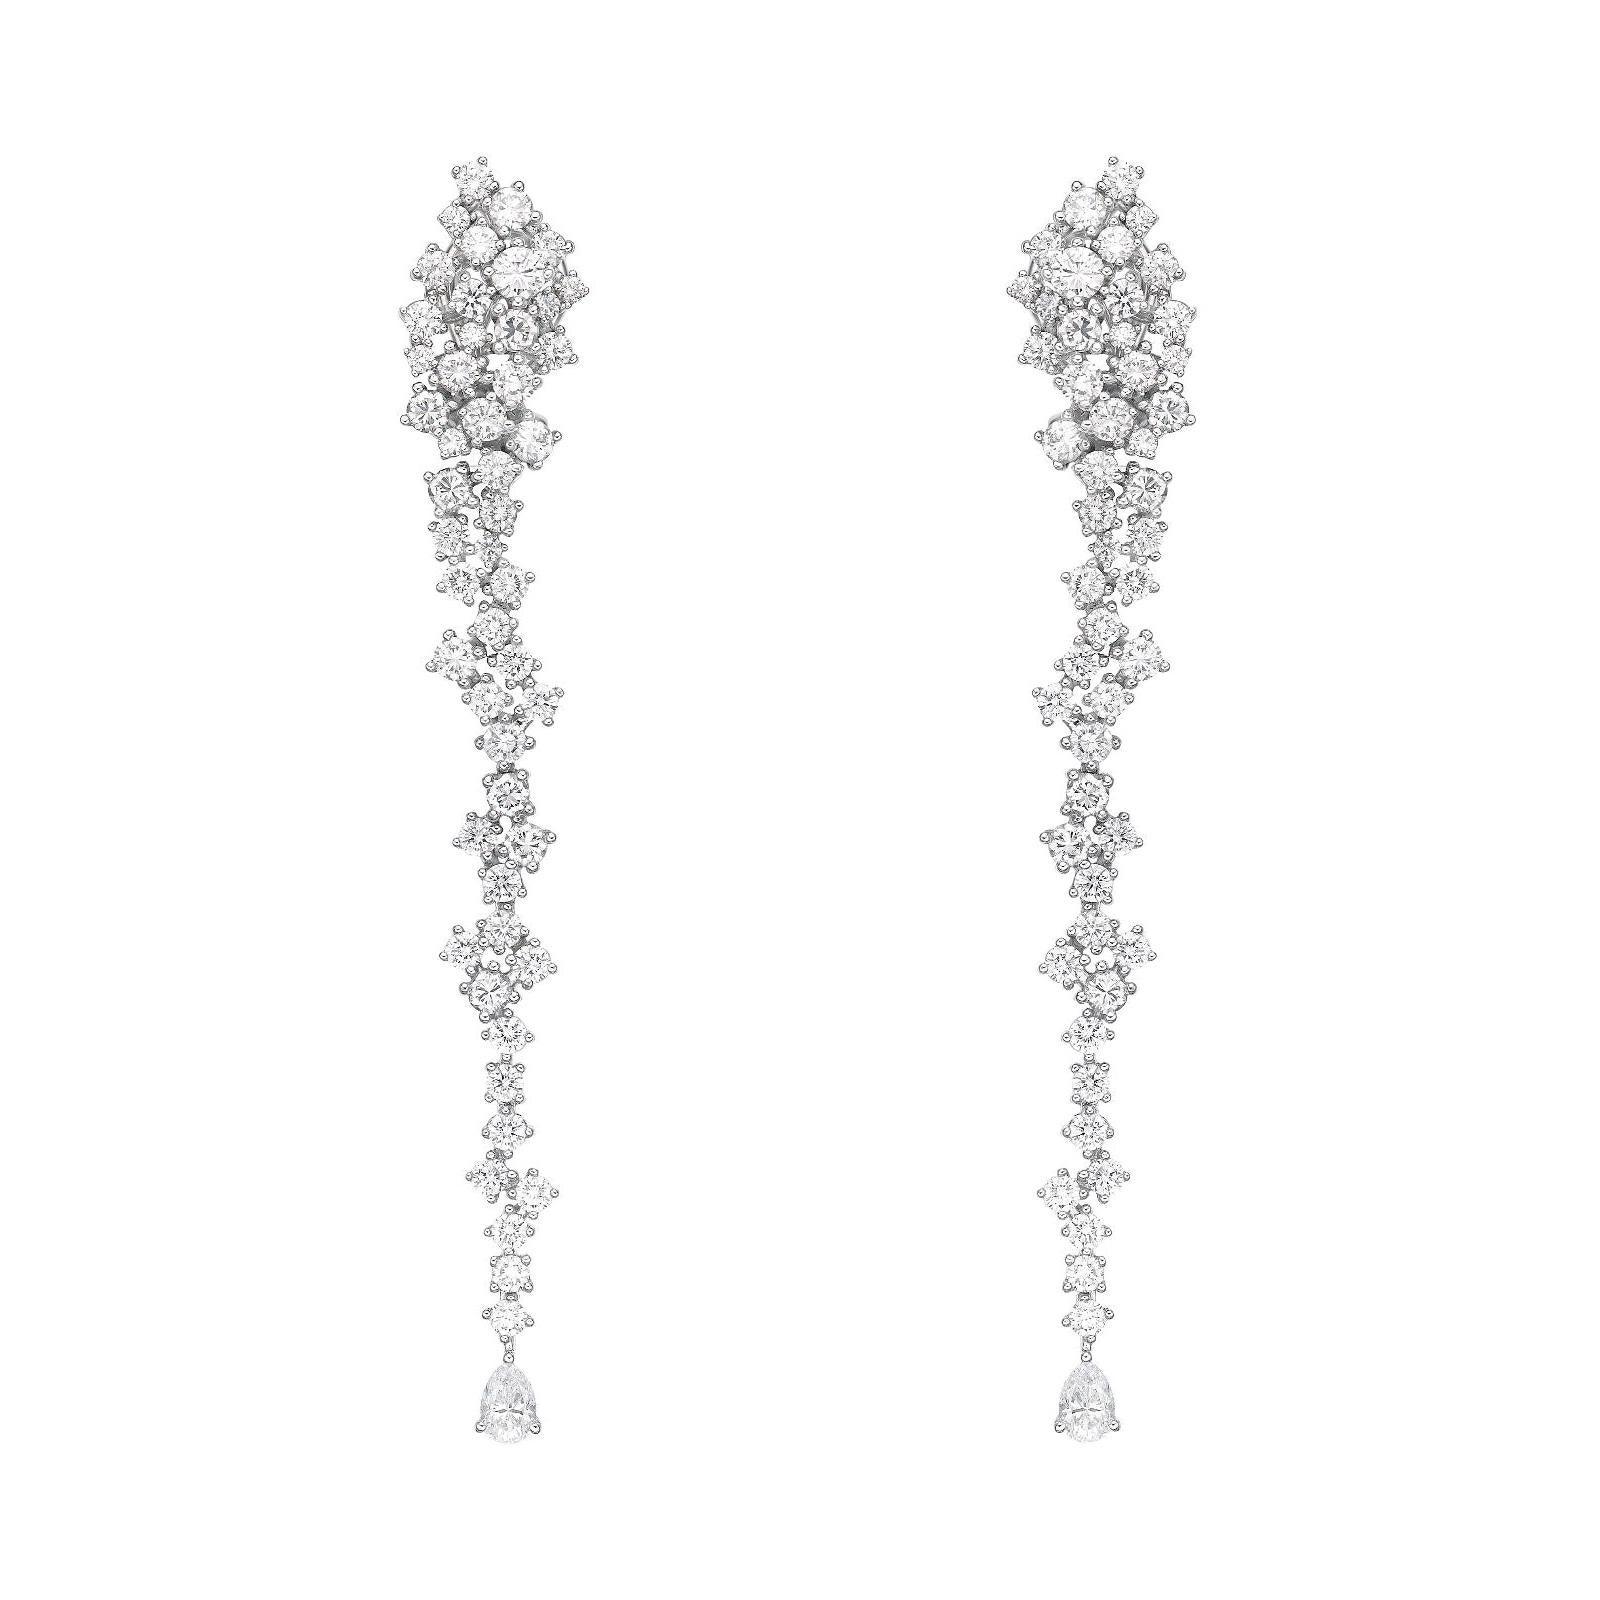 18 Karat Gold, 6.6 Carat, F Color, VS Clarity, Dainty Diamond Earrings